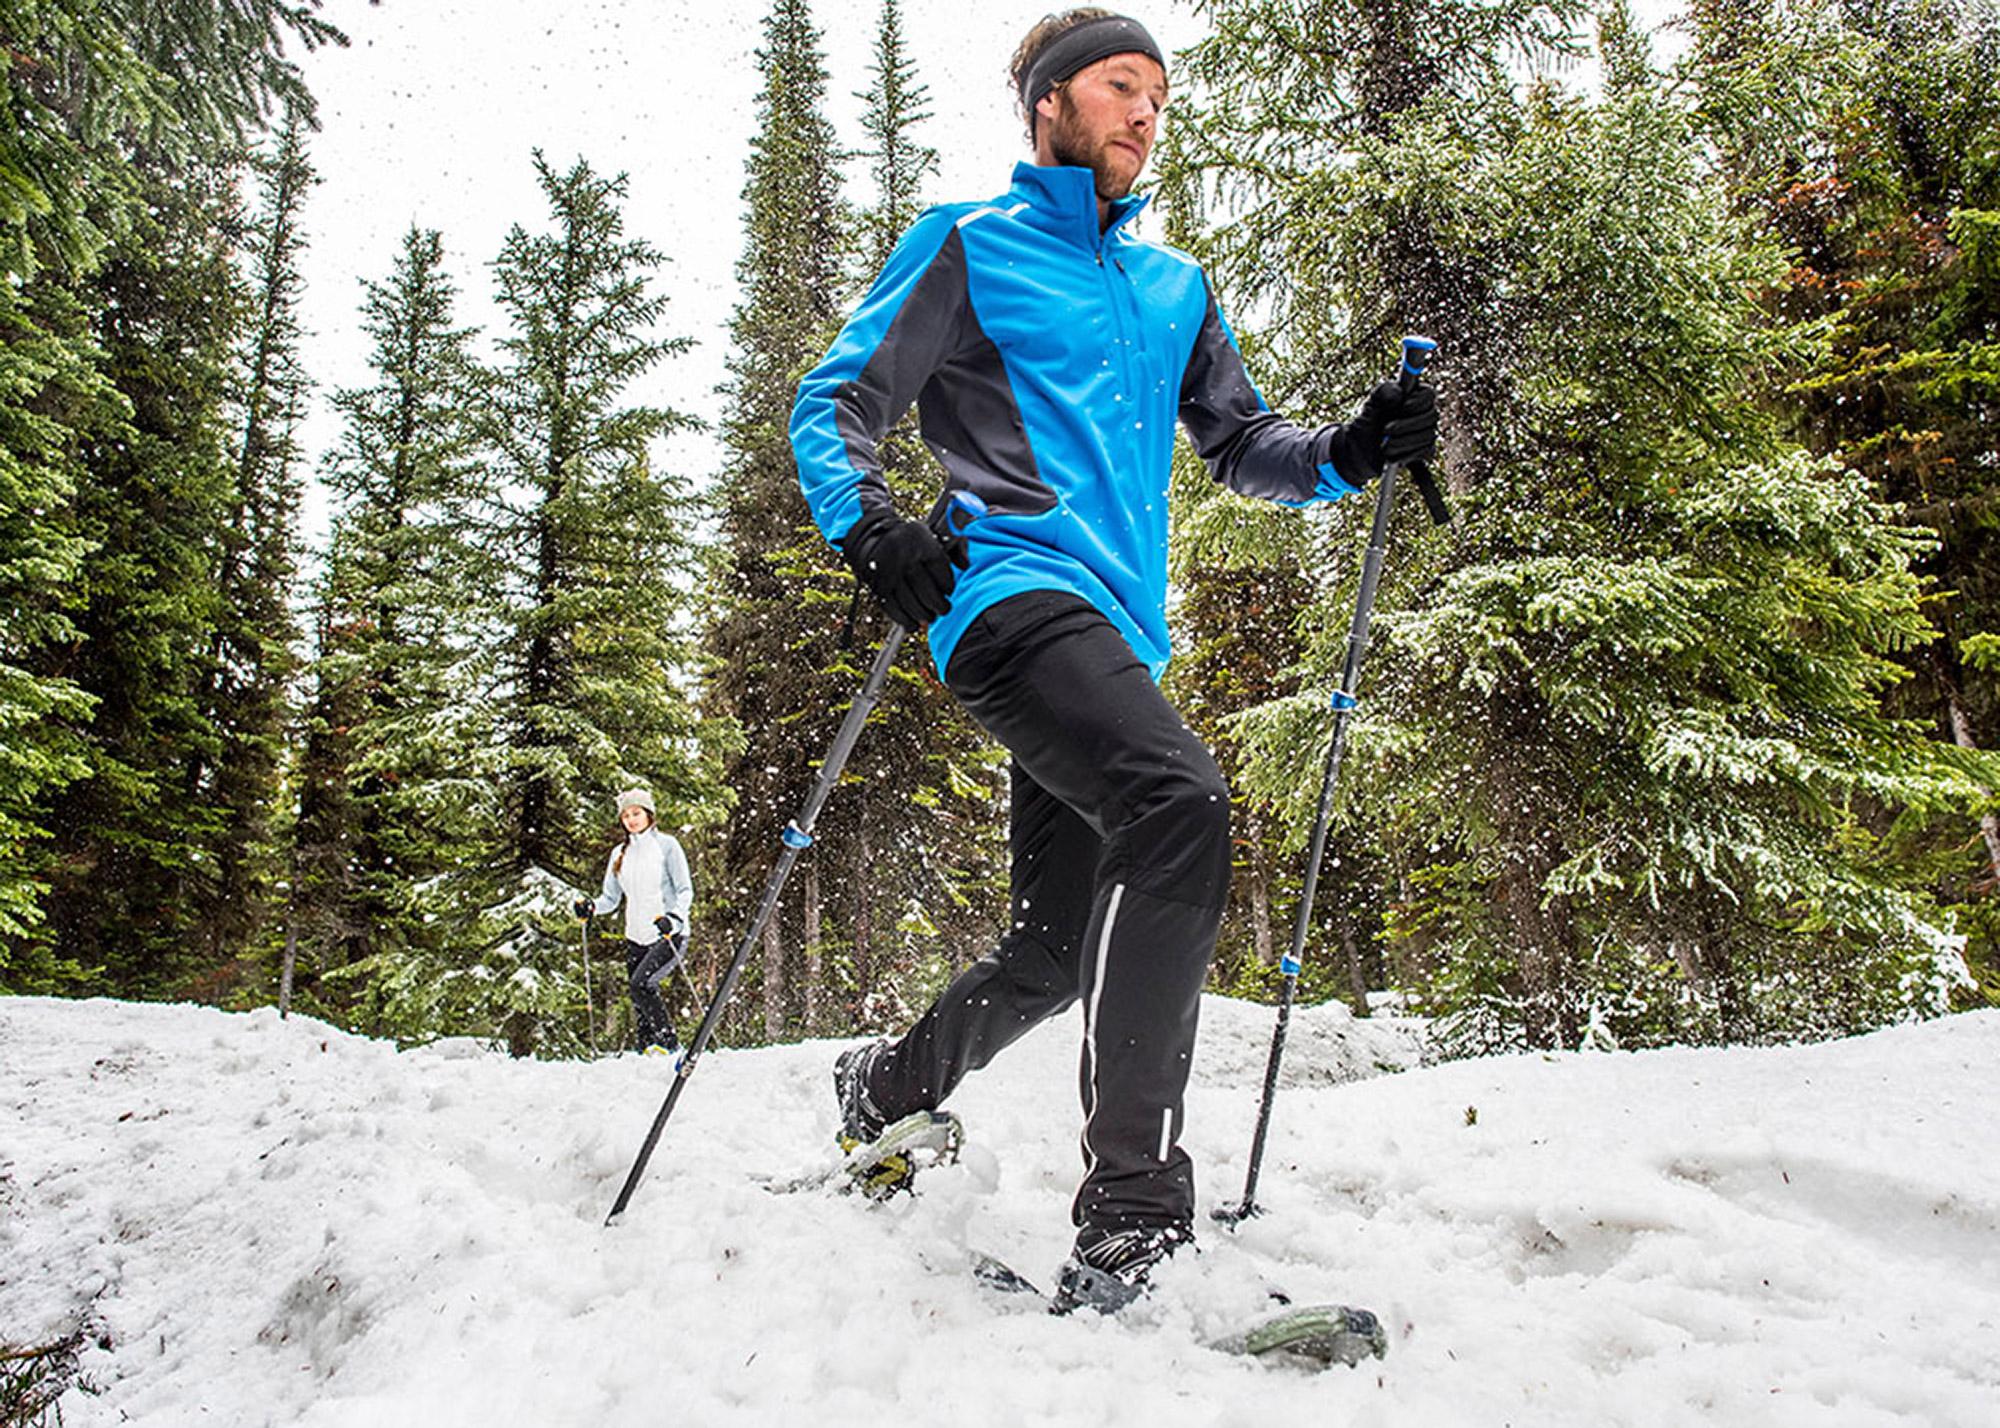 EMS-Winter-Active-SnowShoe-7341